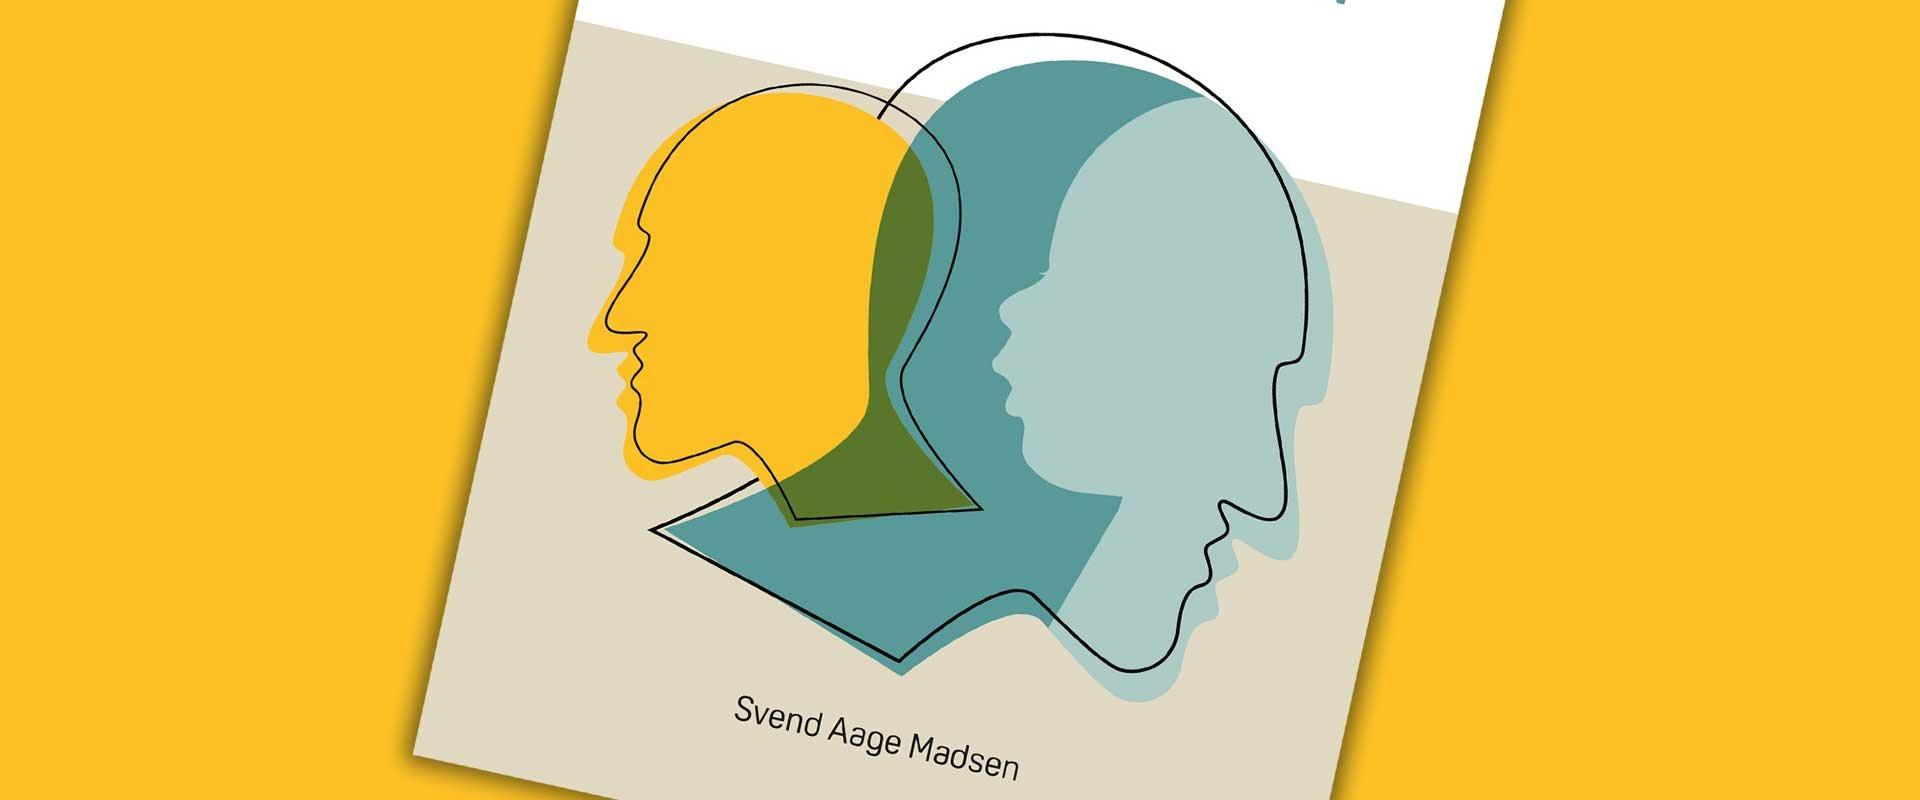 FXA-Svend-Aage-Madsen-Depression-01